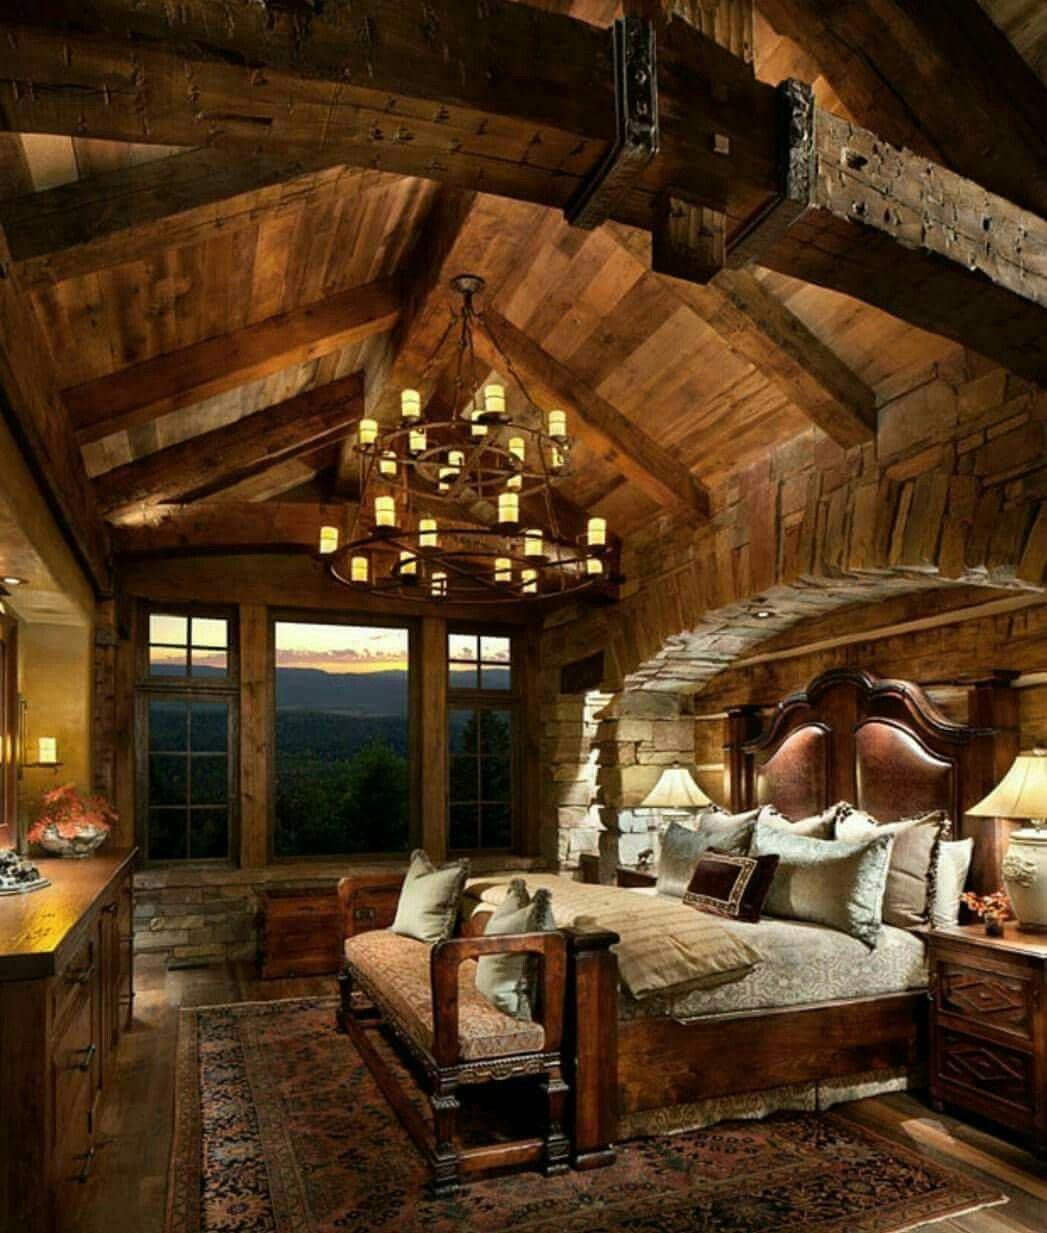 Rustic Log Cabin Bedroom Ideas Rustic House Rustic Home Design